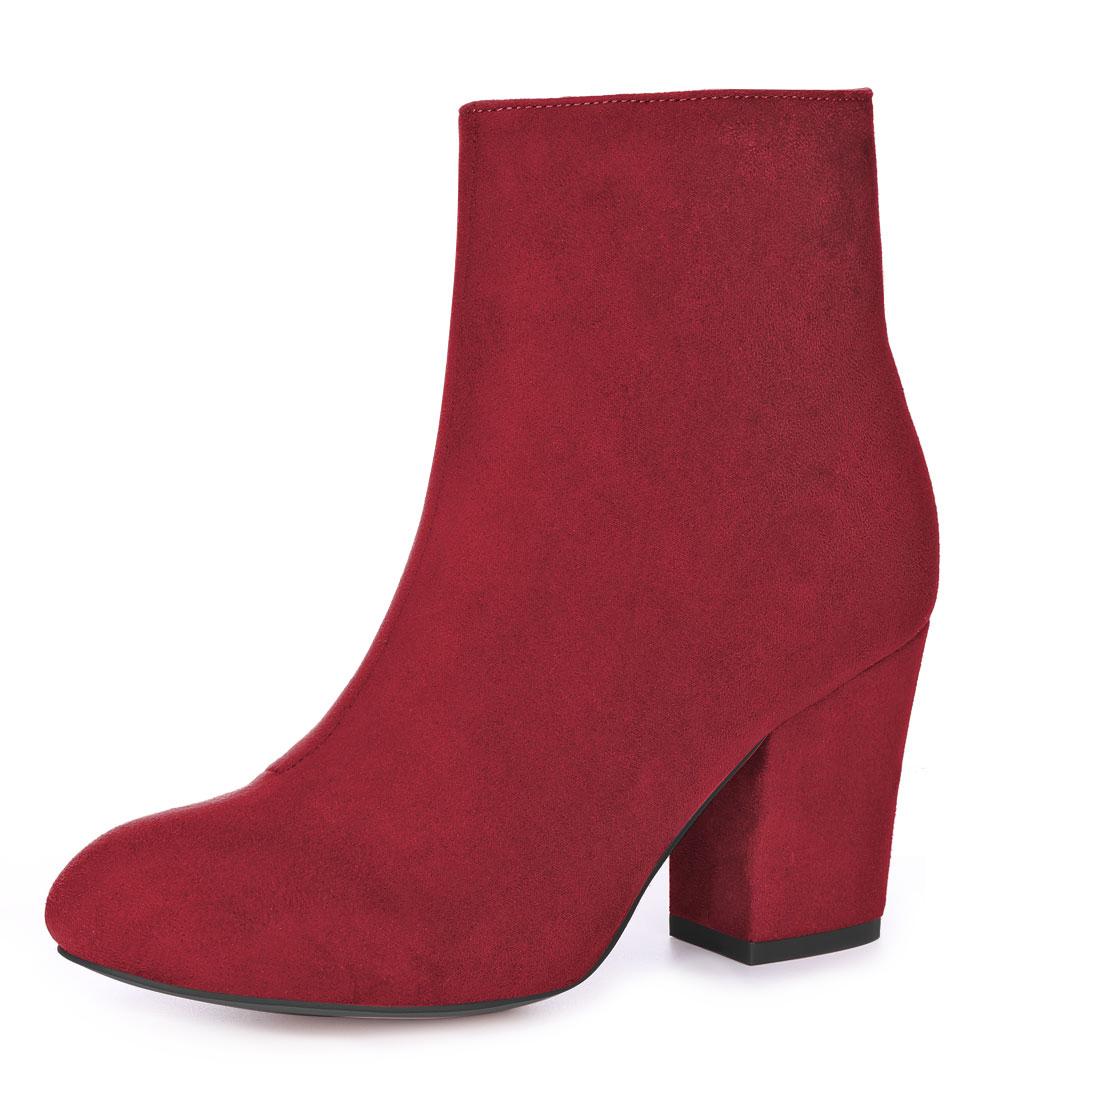 Allegra K Women Round Toe Side Zipper Block Heel Ankle Boots Red US 10